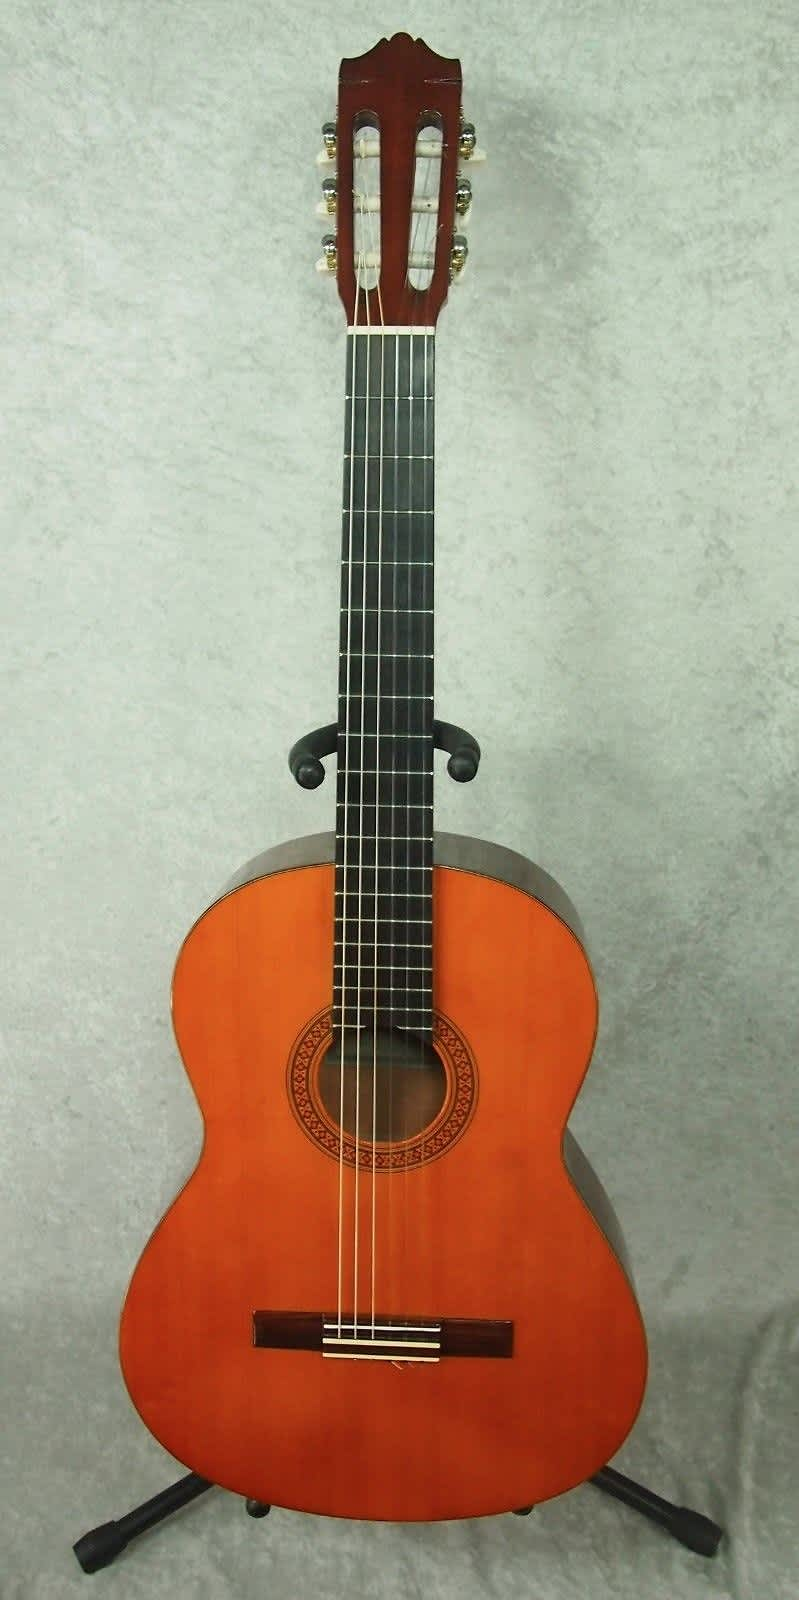 Yamaha cg 100a classical acoustic guitar reverb for Yamaha cg150sa classical guitar